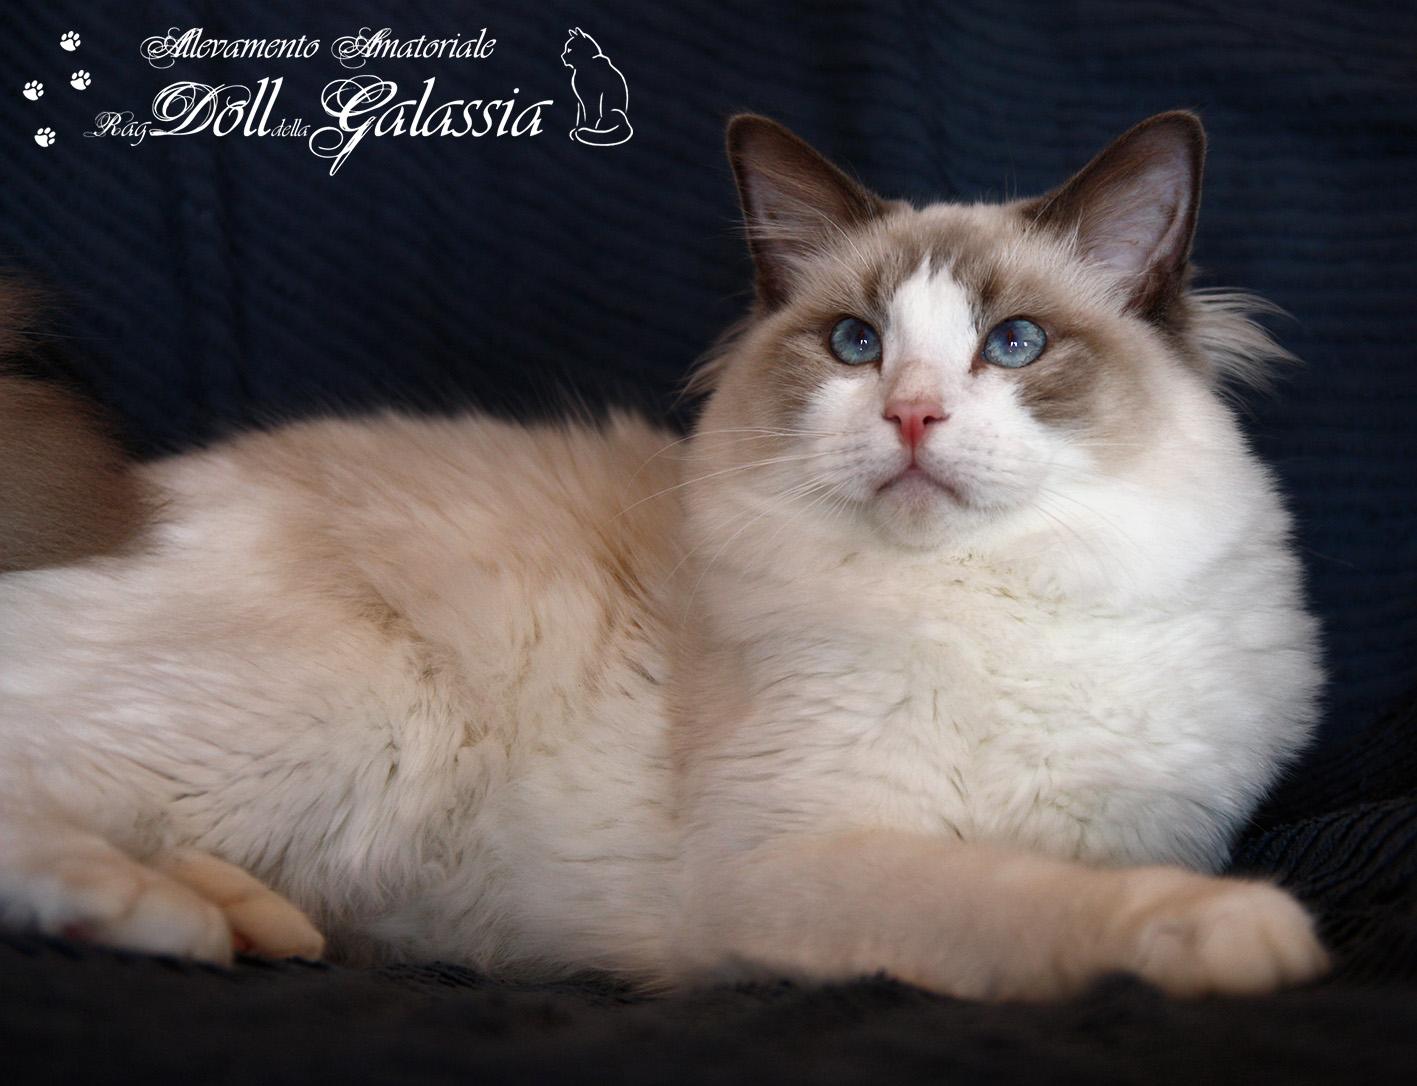 Dollgalassia-Felis-3